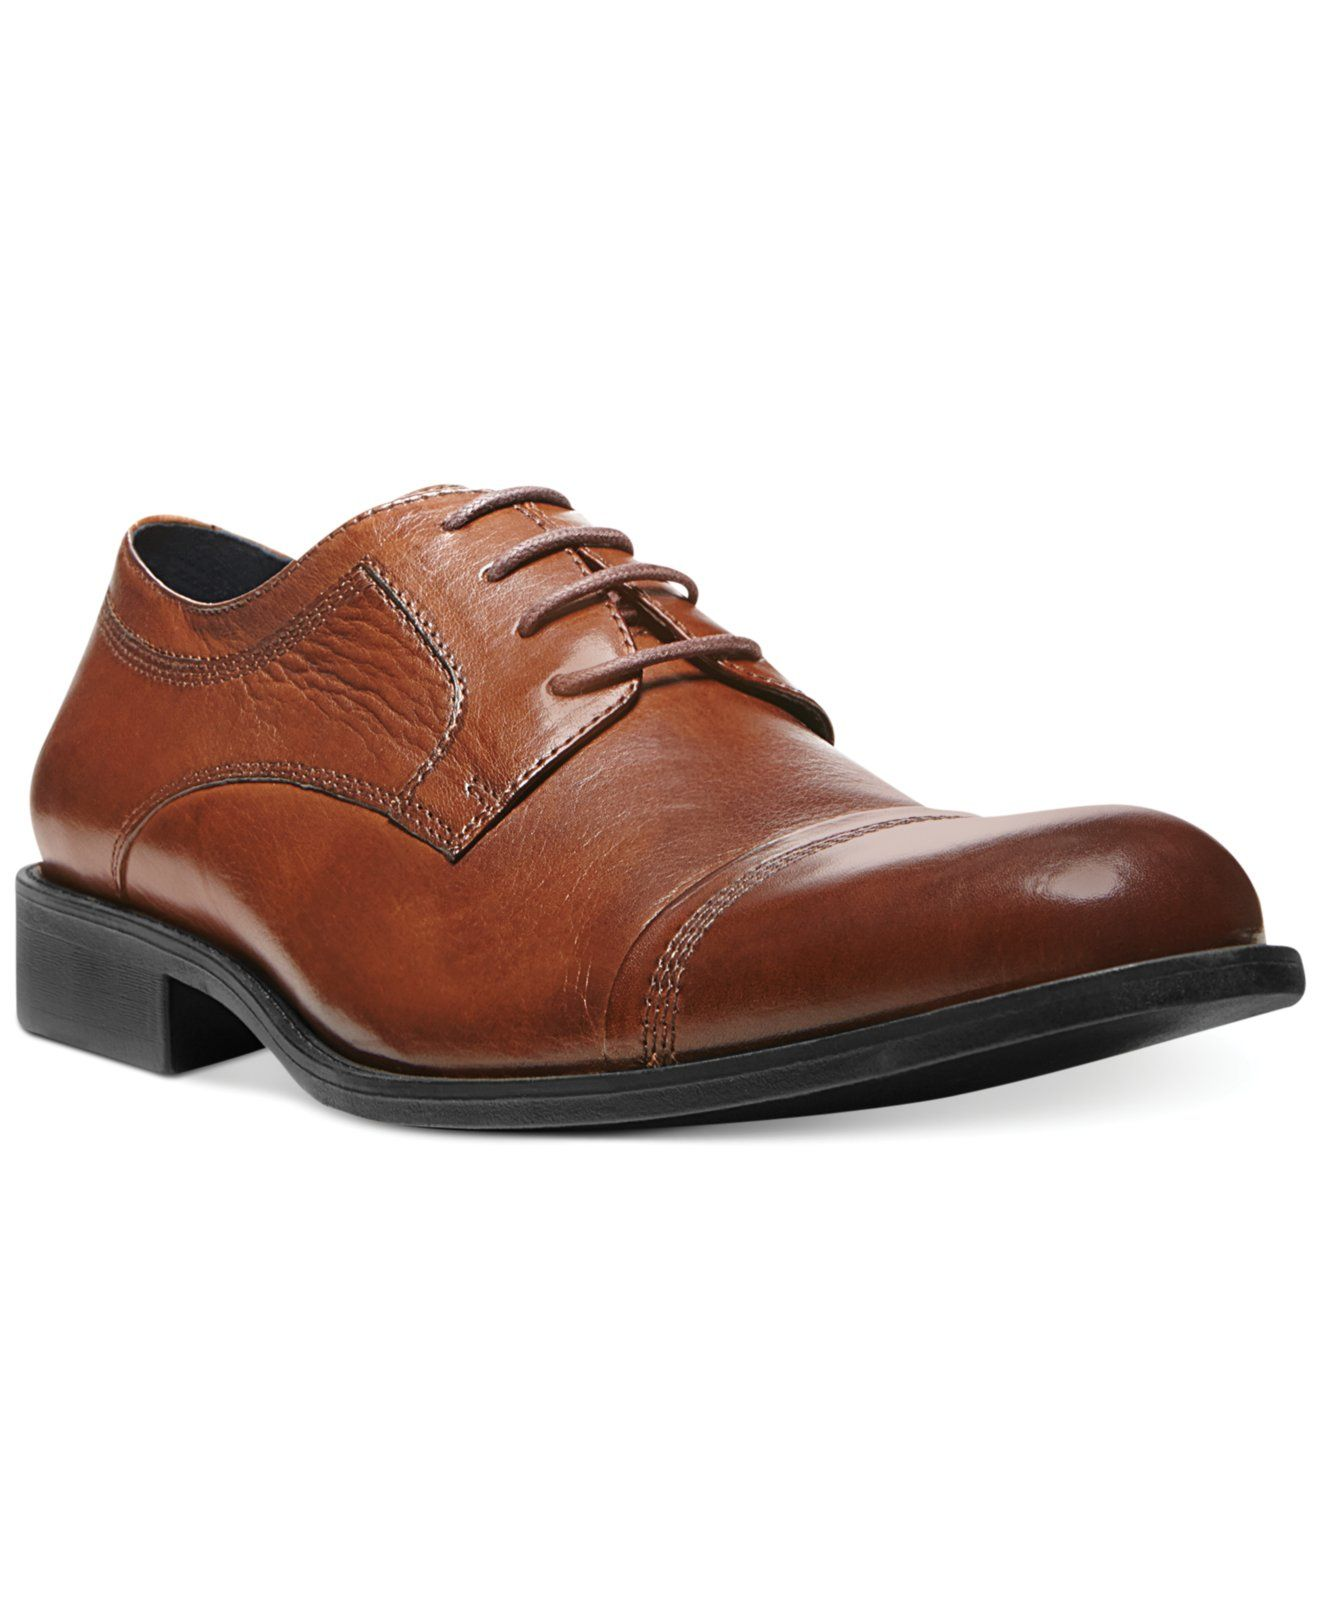 605331e77fd Steve Madden Minted Cap-Toe Oxfords - Shoes - Men - Macy's | Color ...